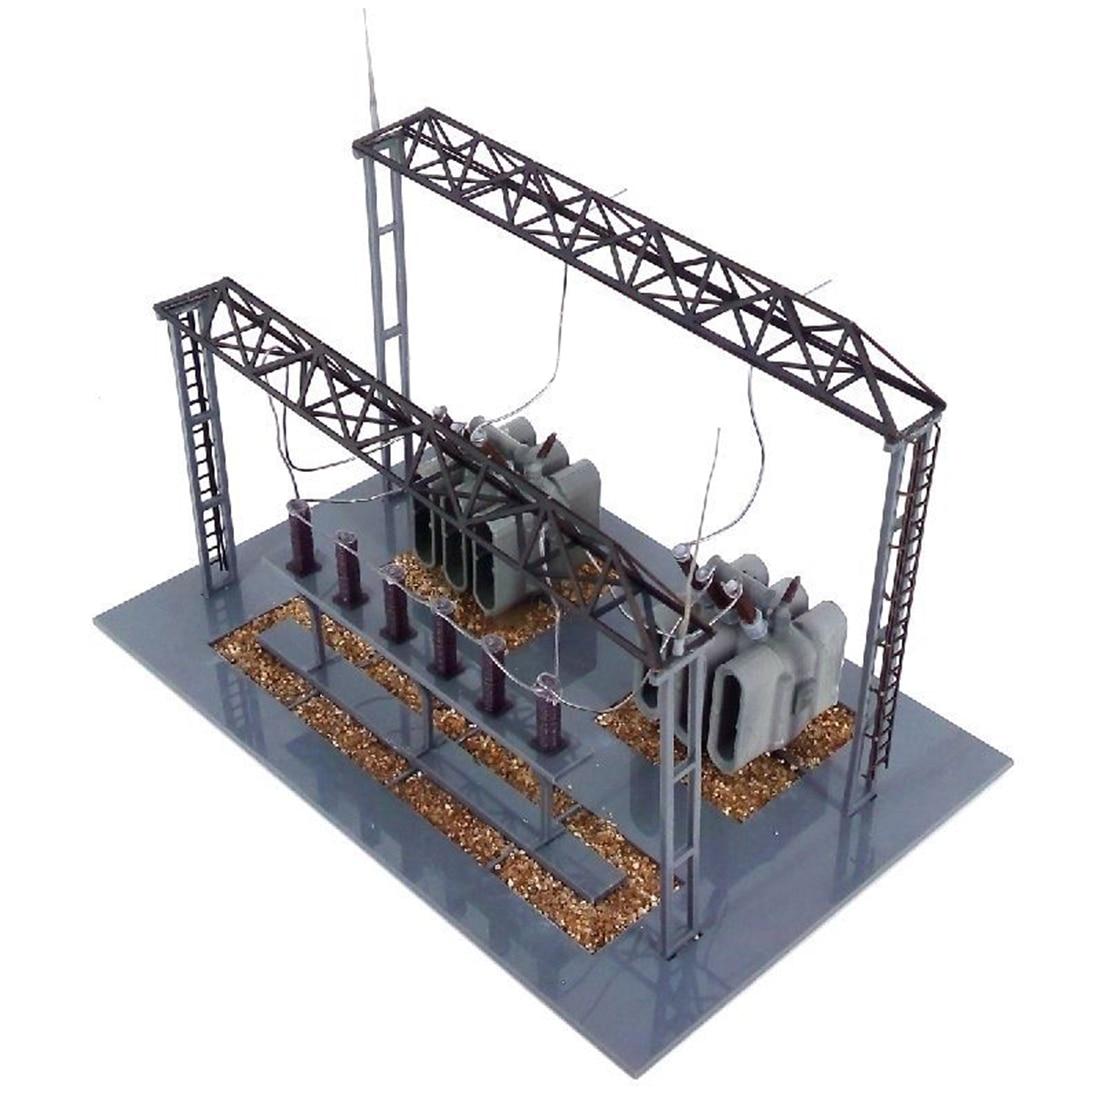 NFSTRIKE 1 87 HO Skala Zug Modell Umspannwerk Modell Für Sand Tabelle Ho Skala Modell Zug Zubehör